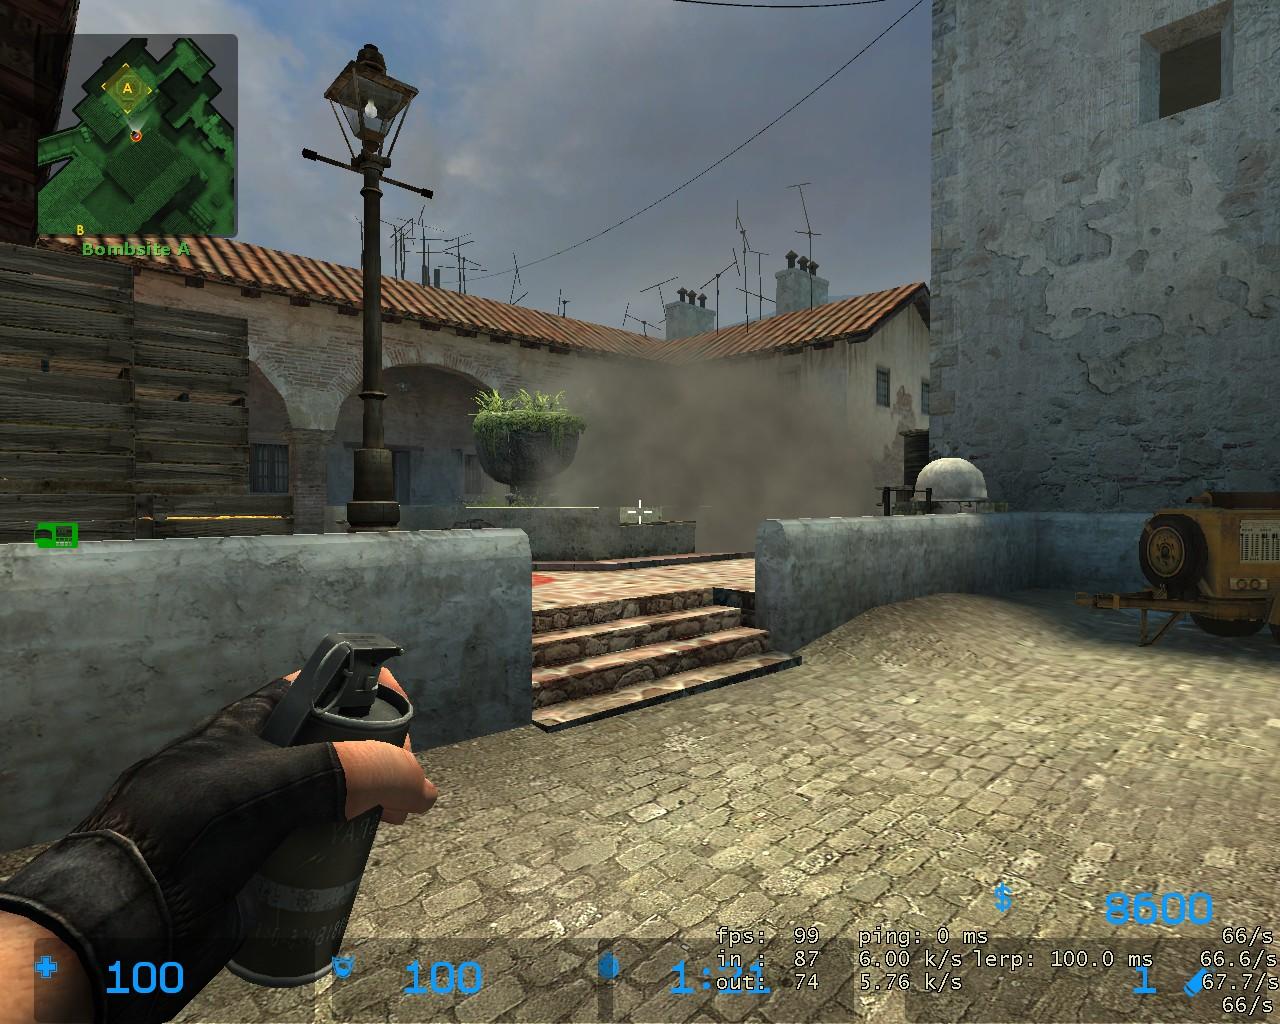 Ian's friend prime-de_inferno-banan-car-jump-smoke-ffect-jpg